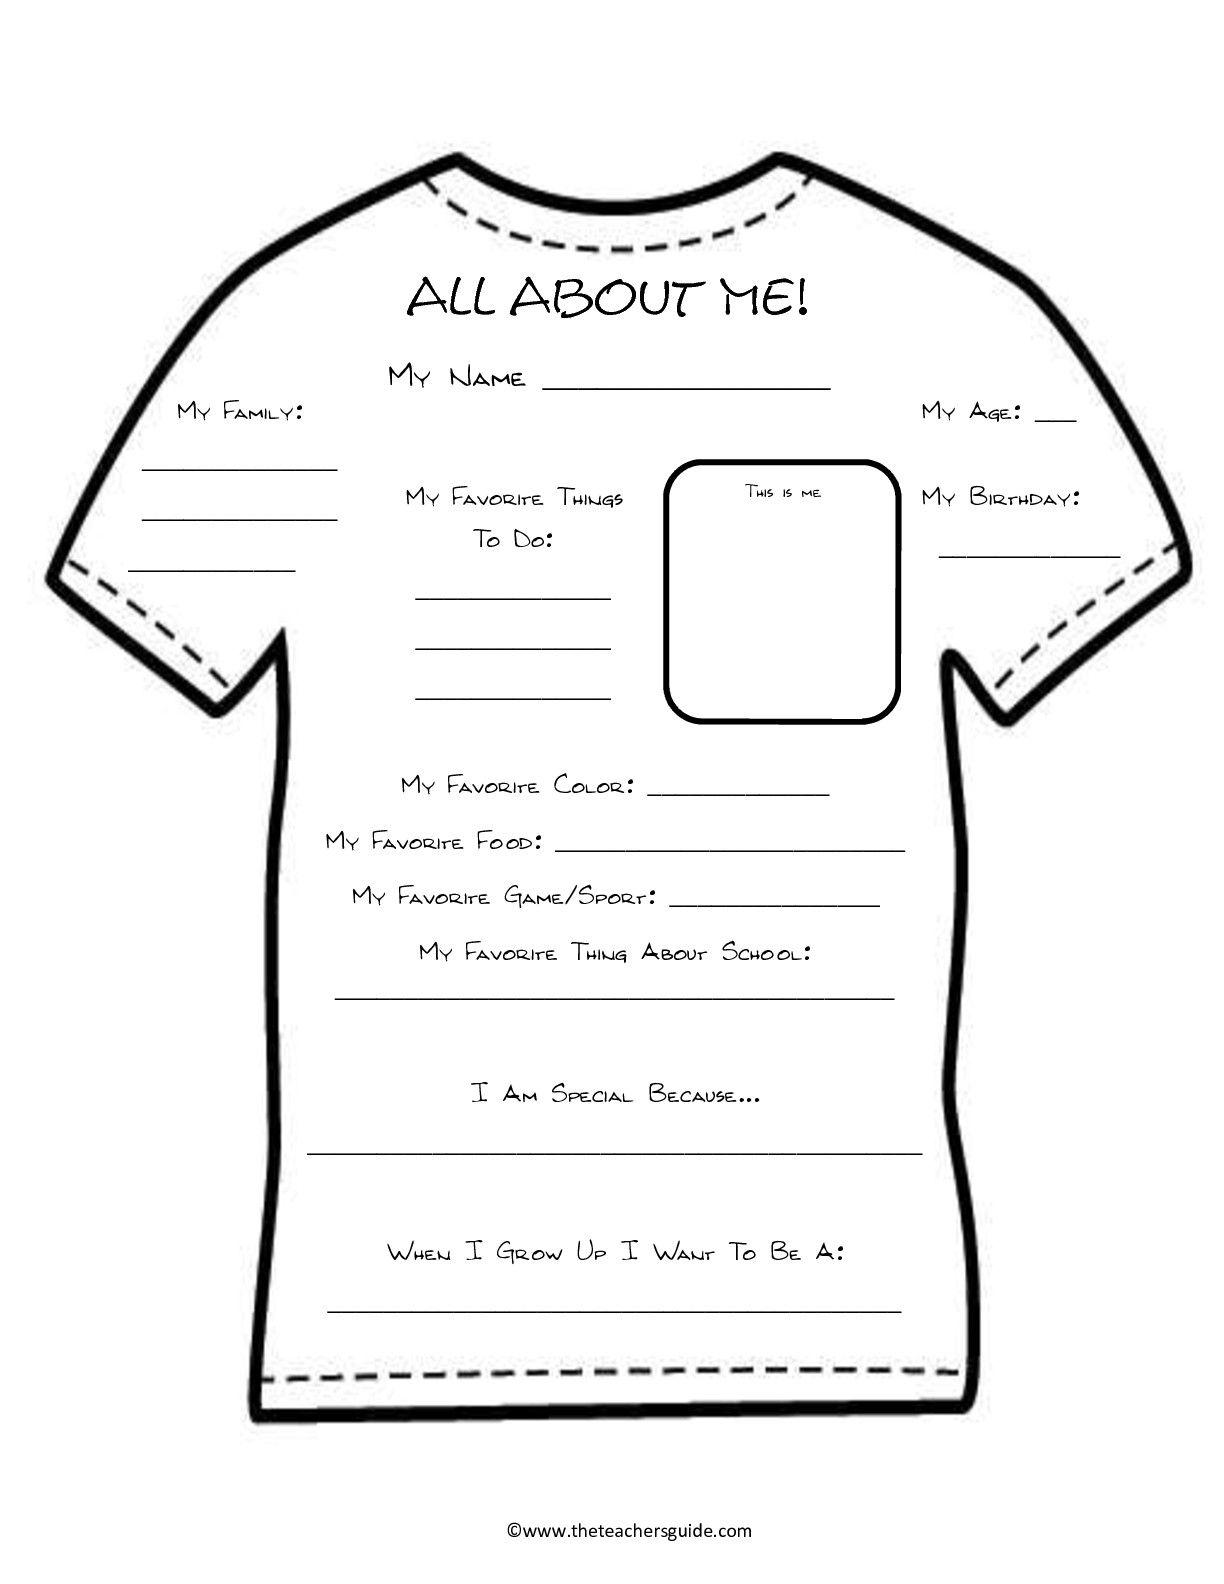 about me worksheet | School | Pinterest